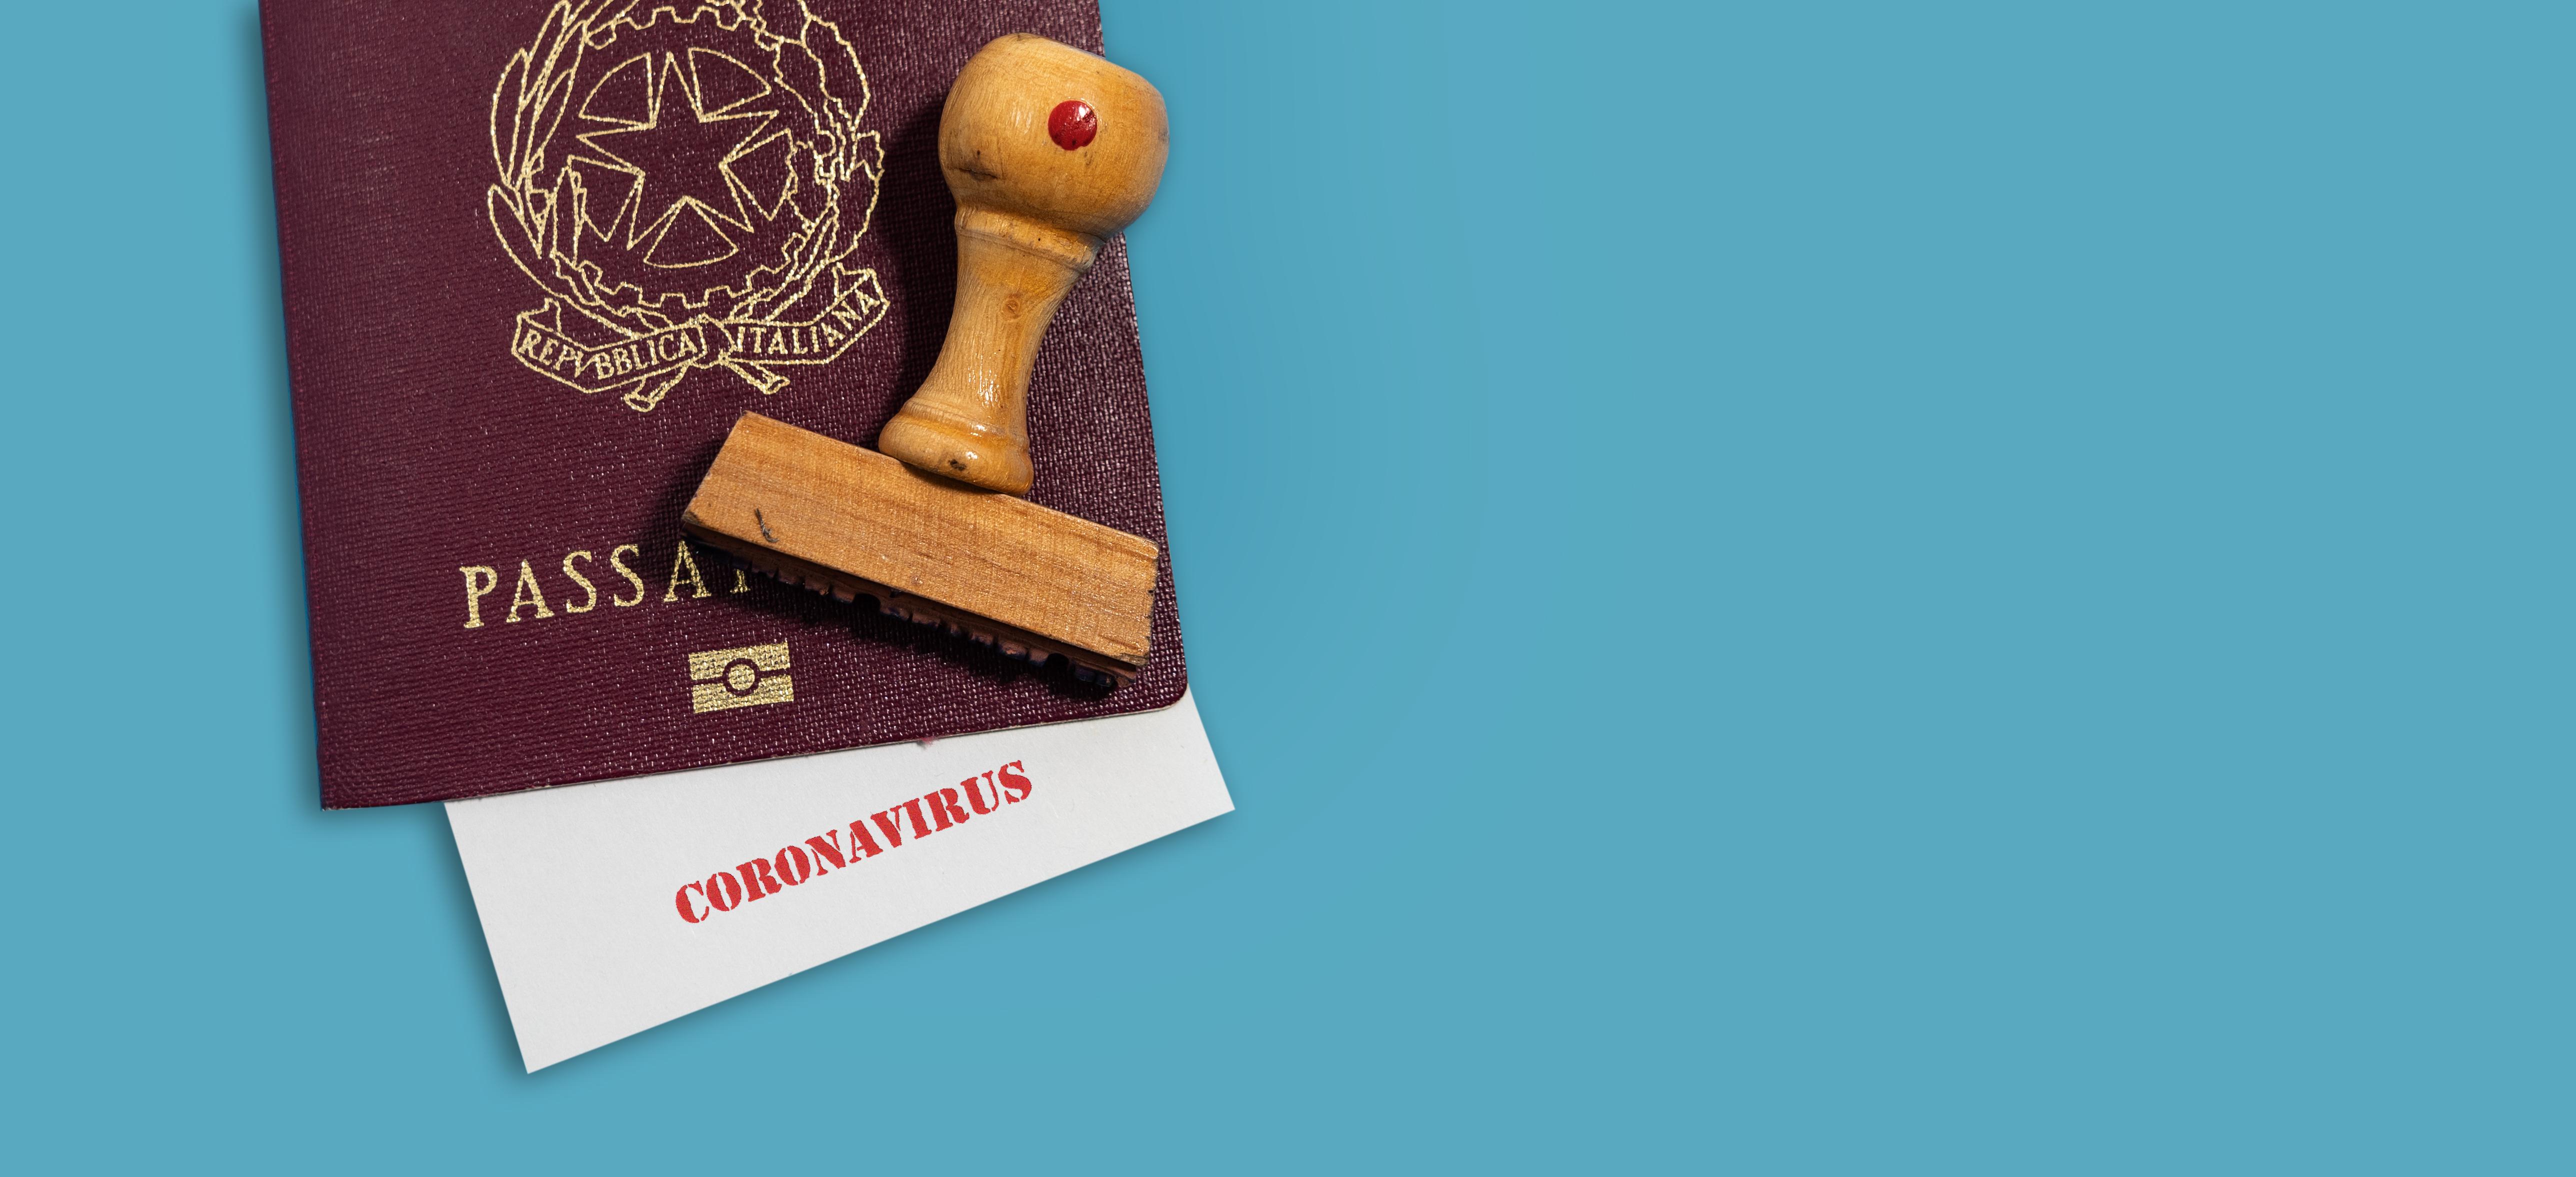 Ministrul de externe britanic: Cardul de vaccinare anti-COVID nu va conferi privilegii